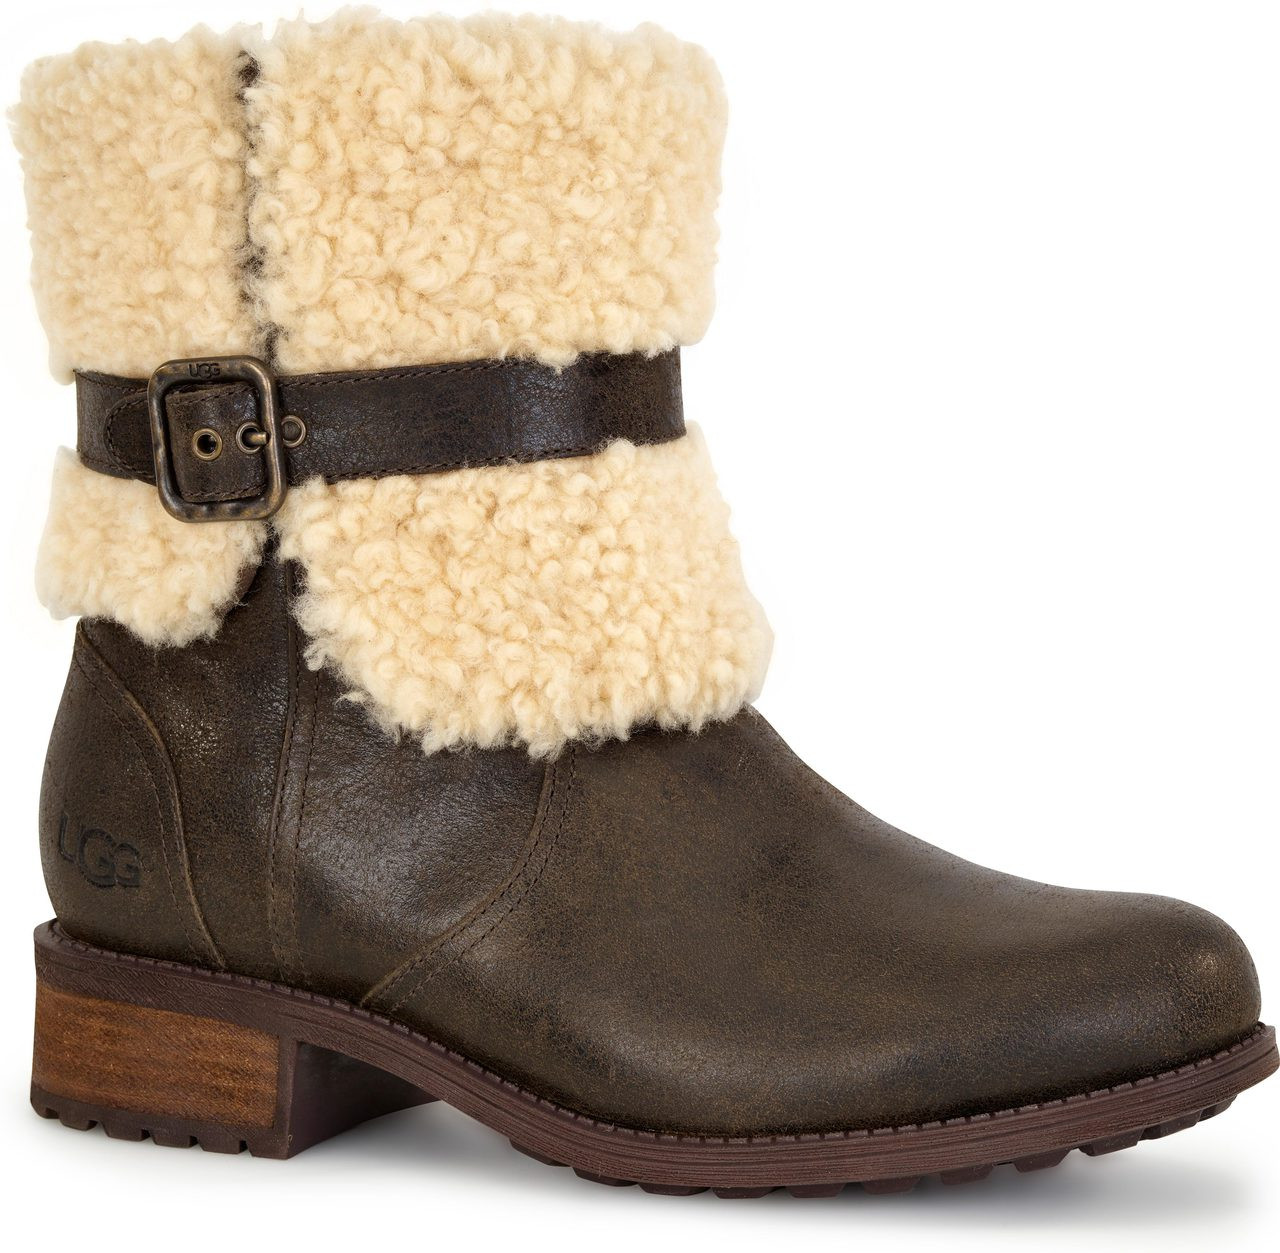 Lodge Leather